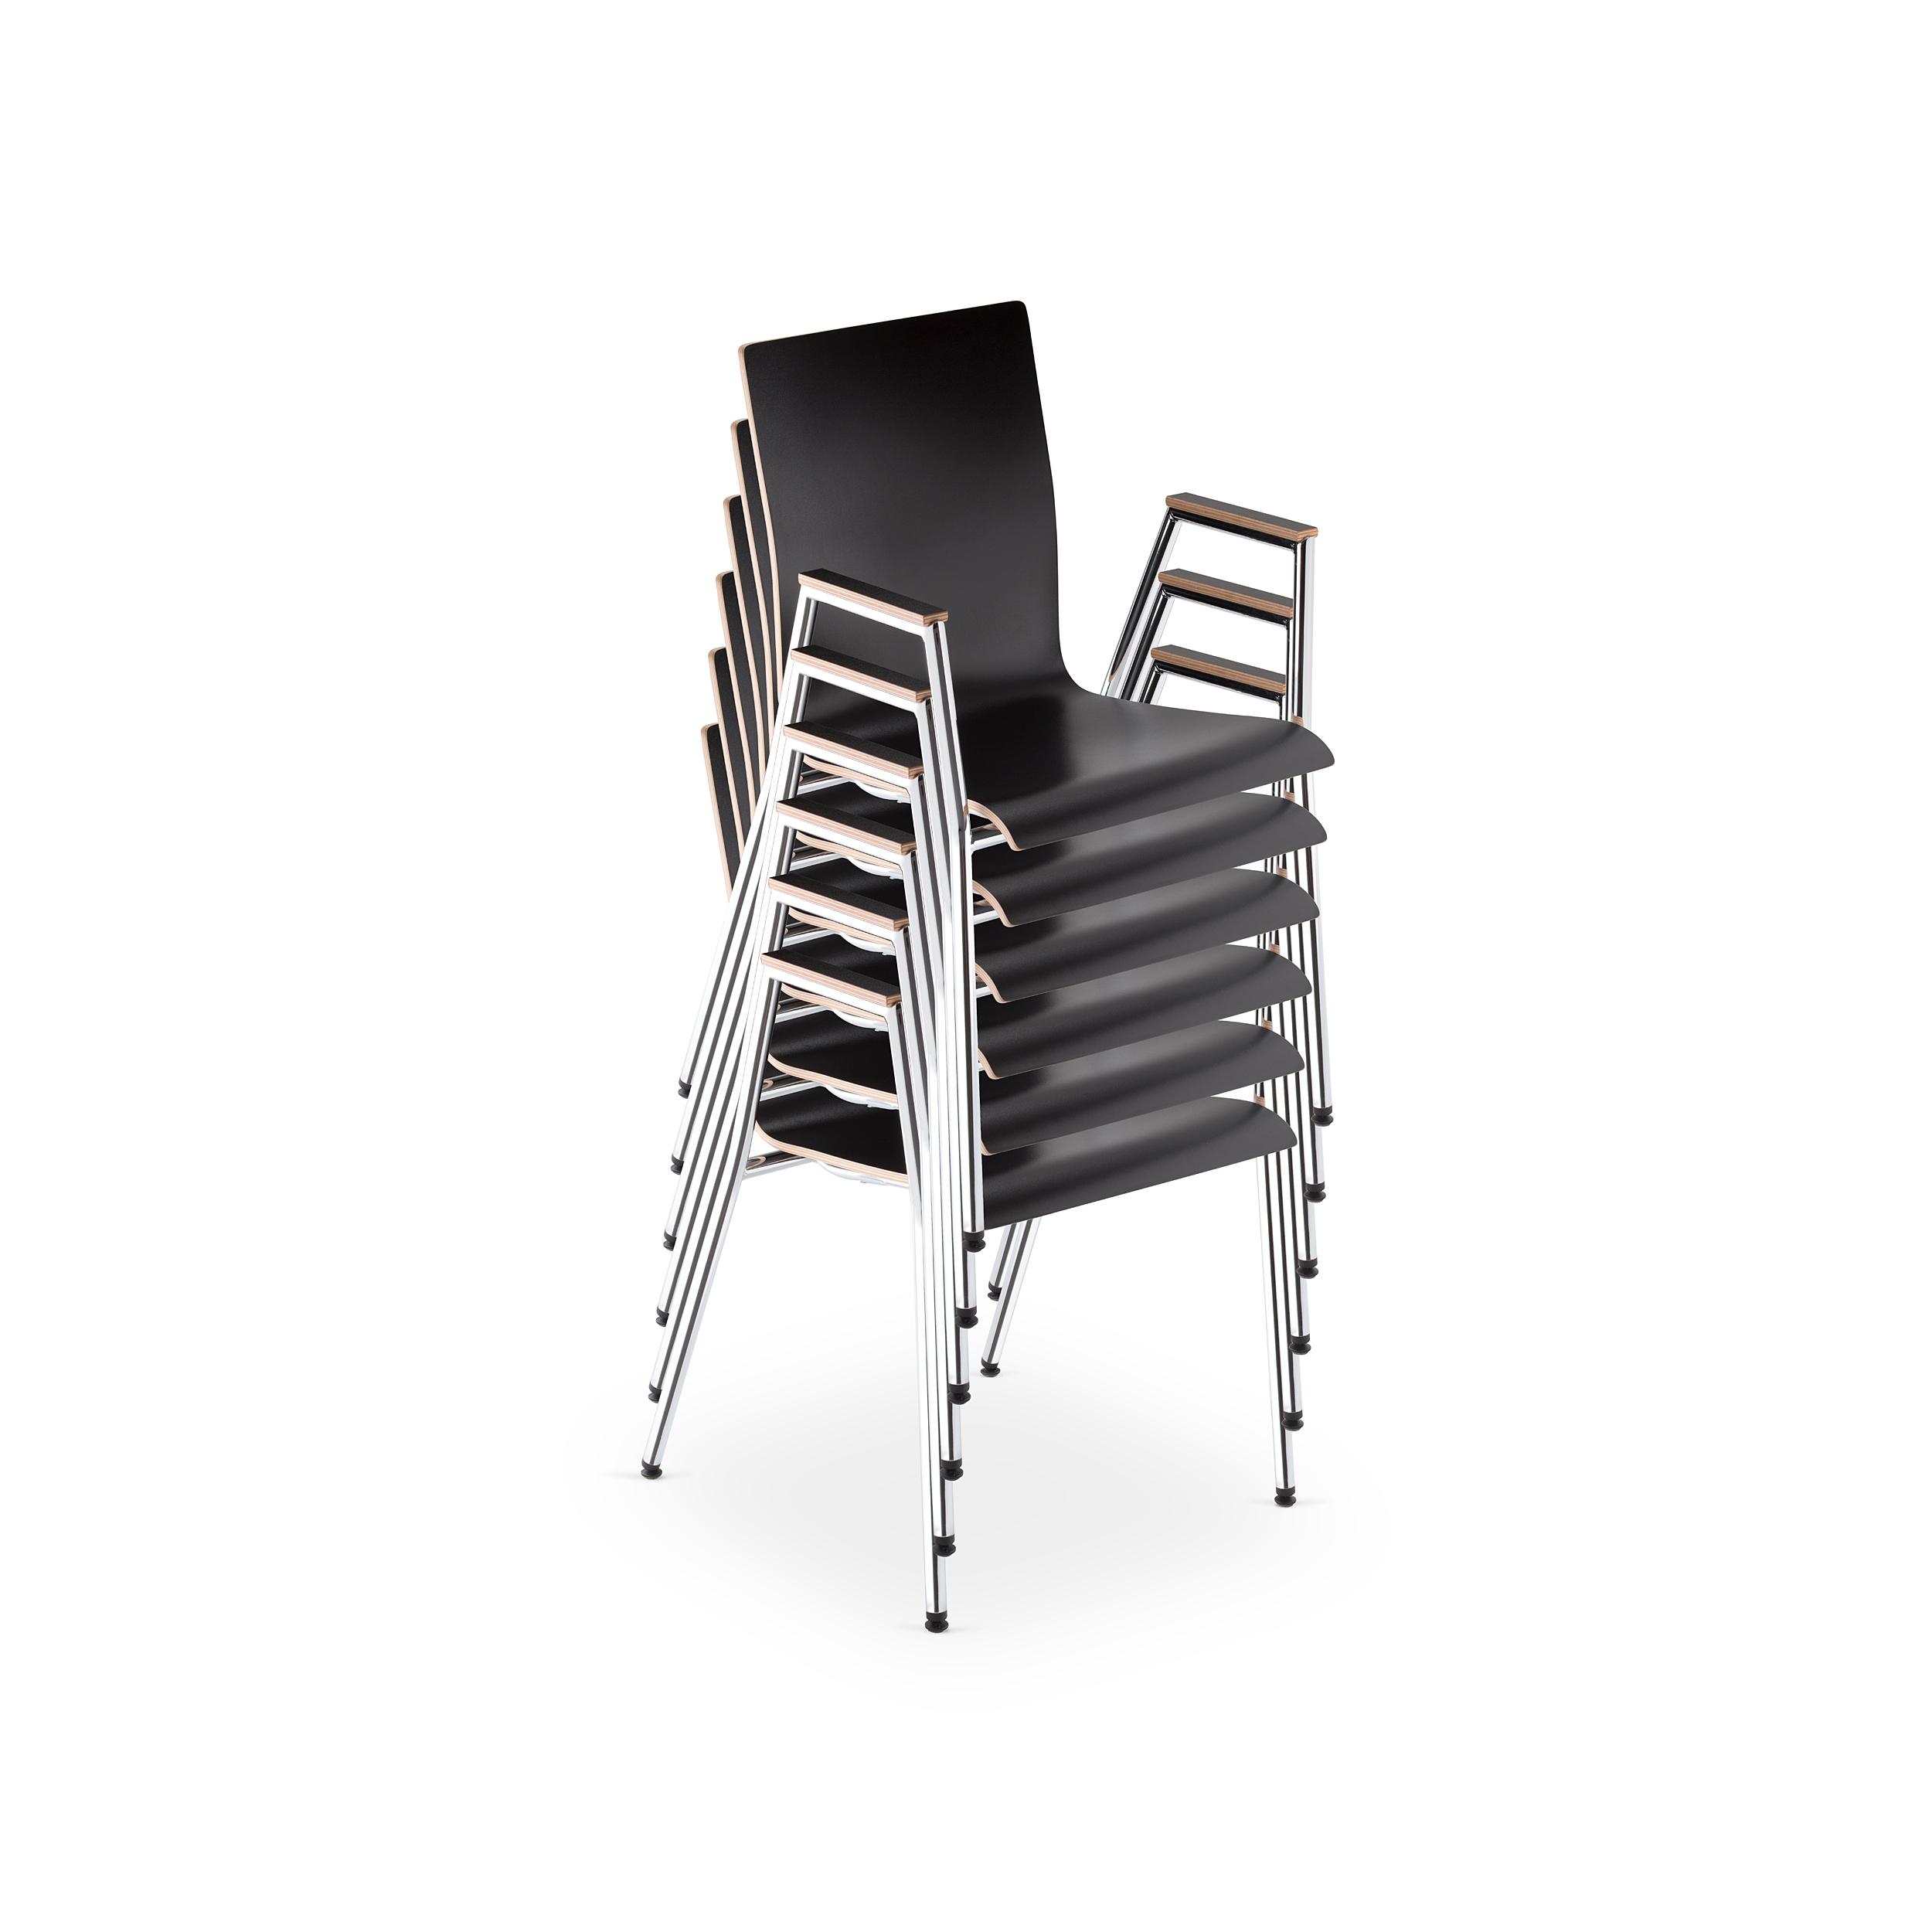 office-chairs_1-1_Cadeira-2.jpg